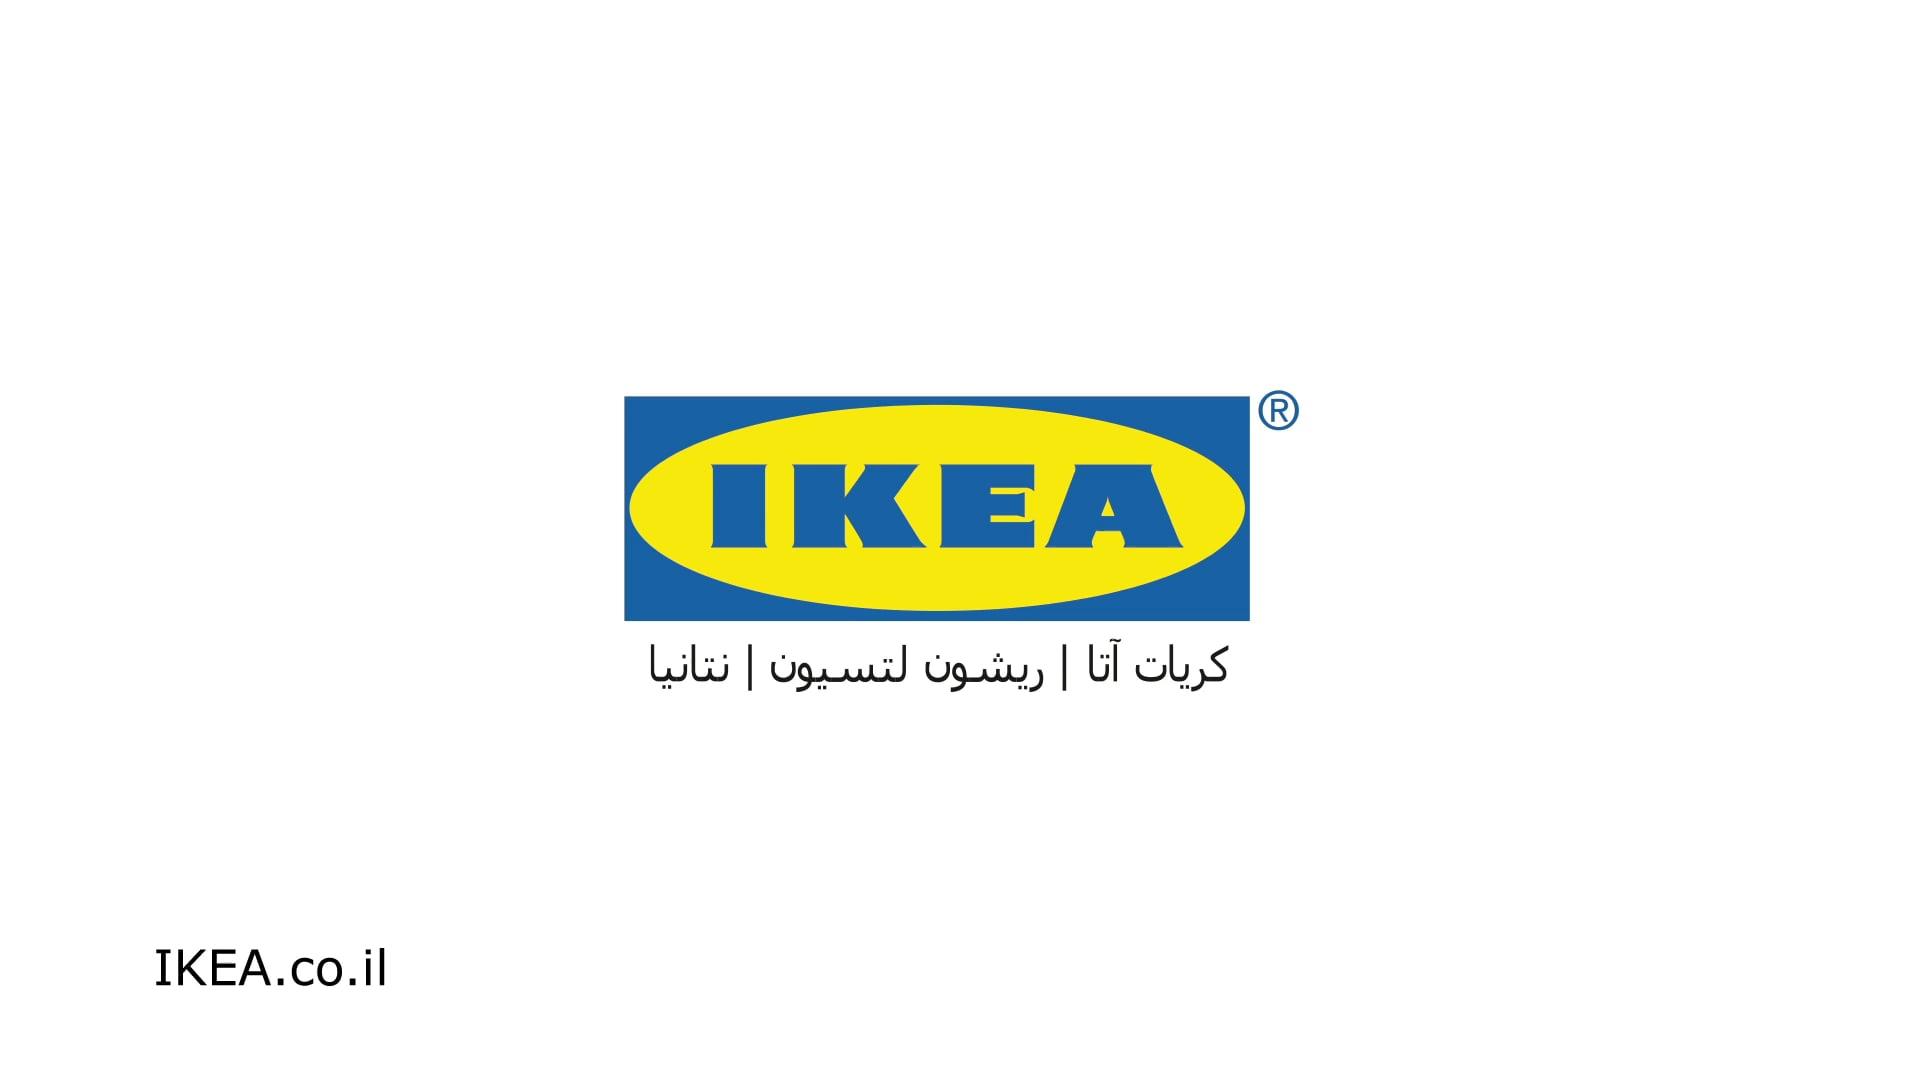 IKEA Architects